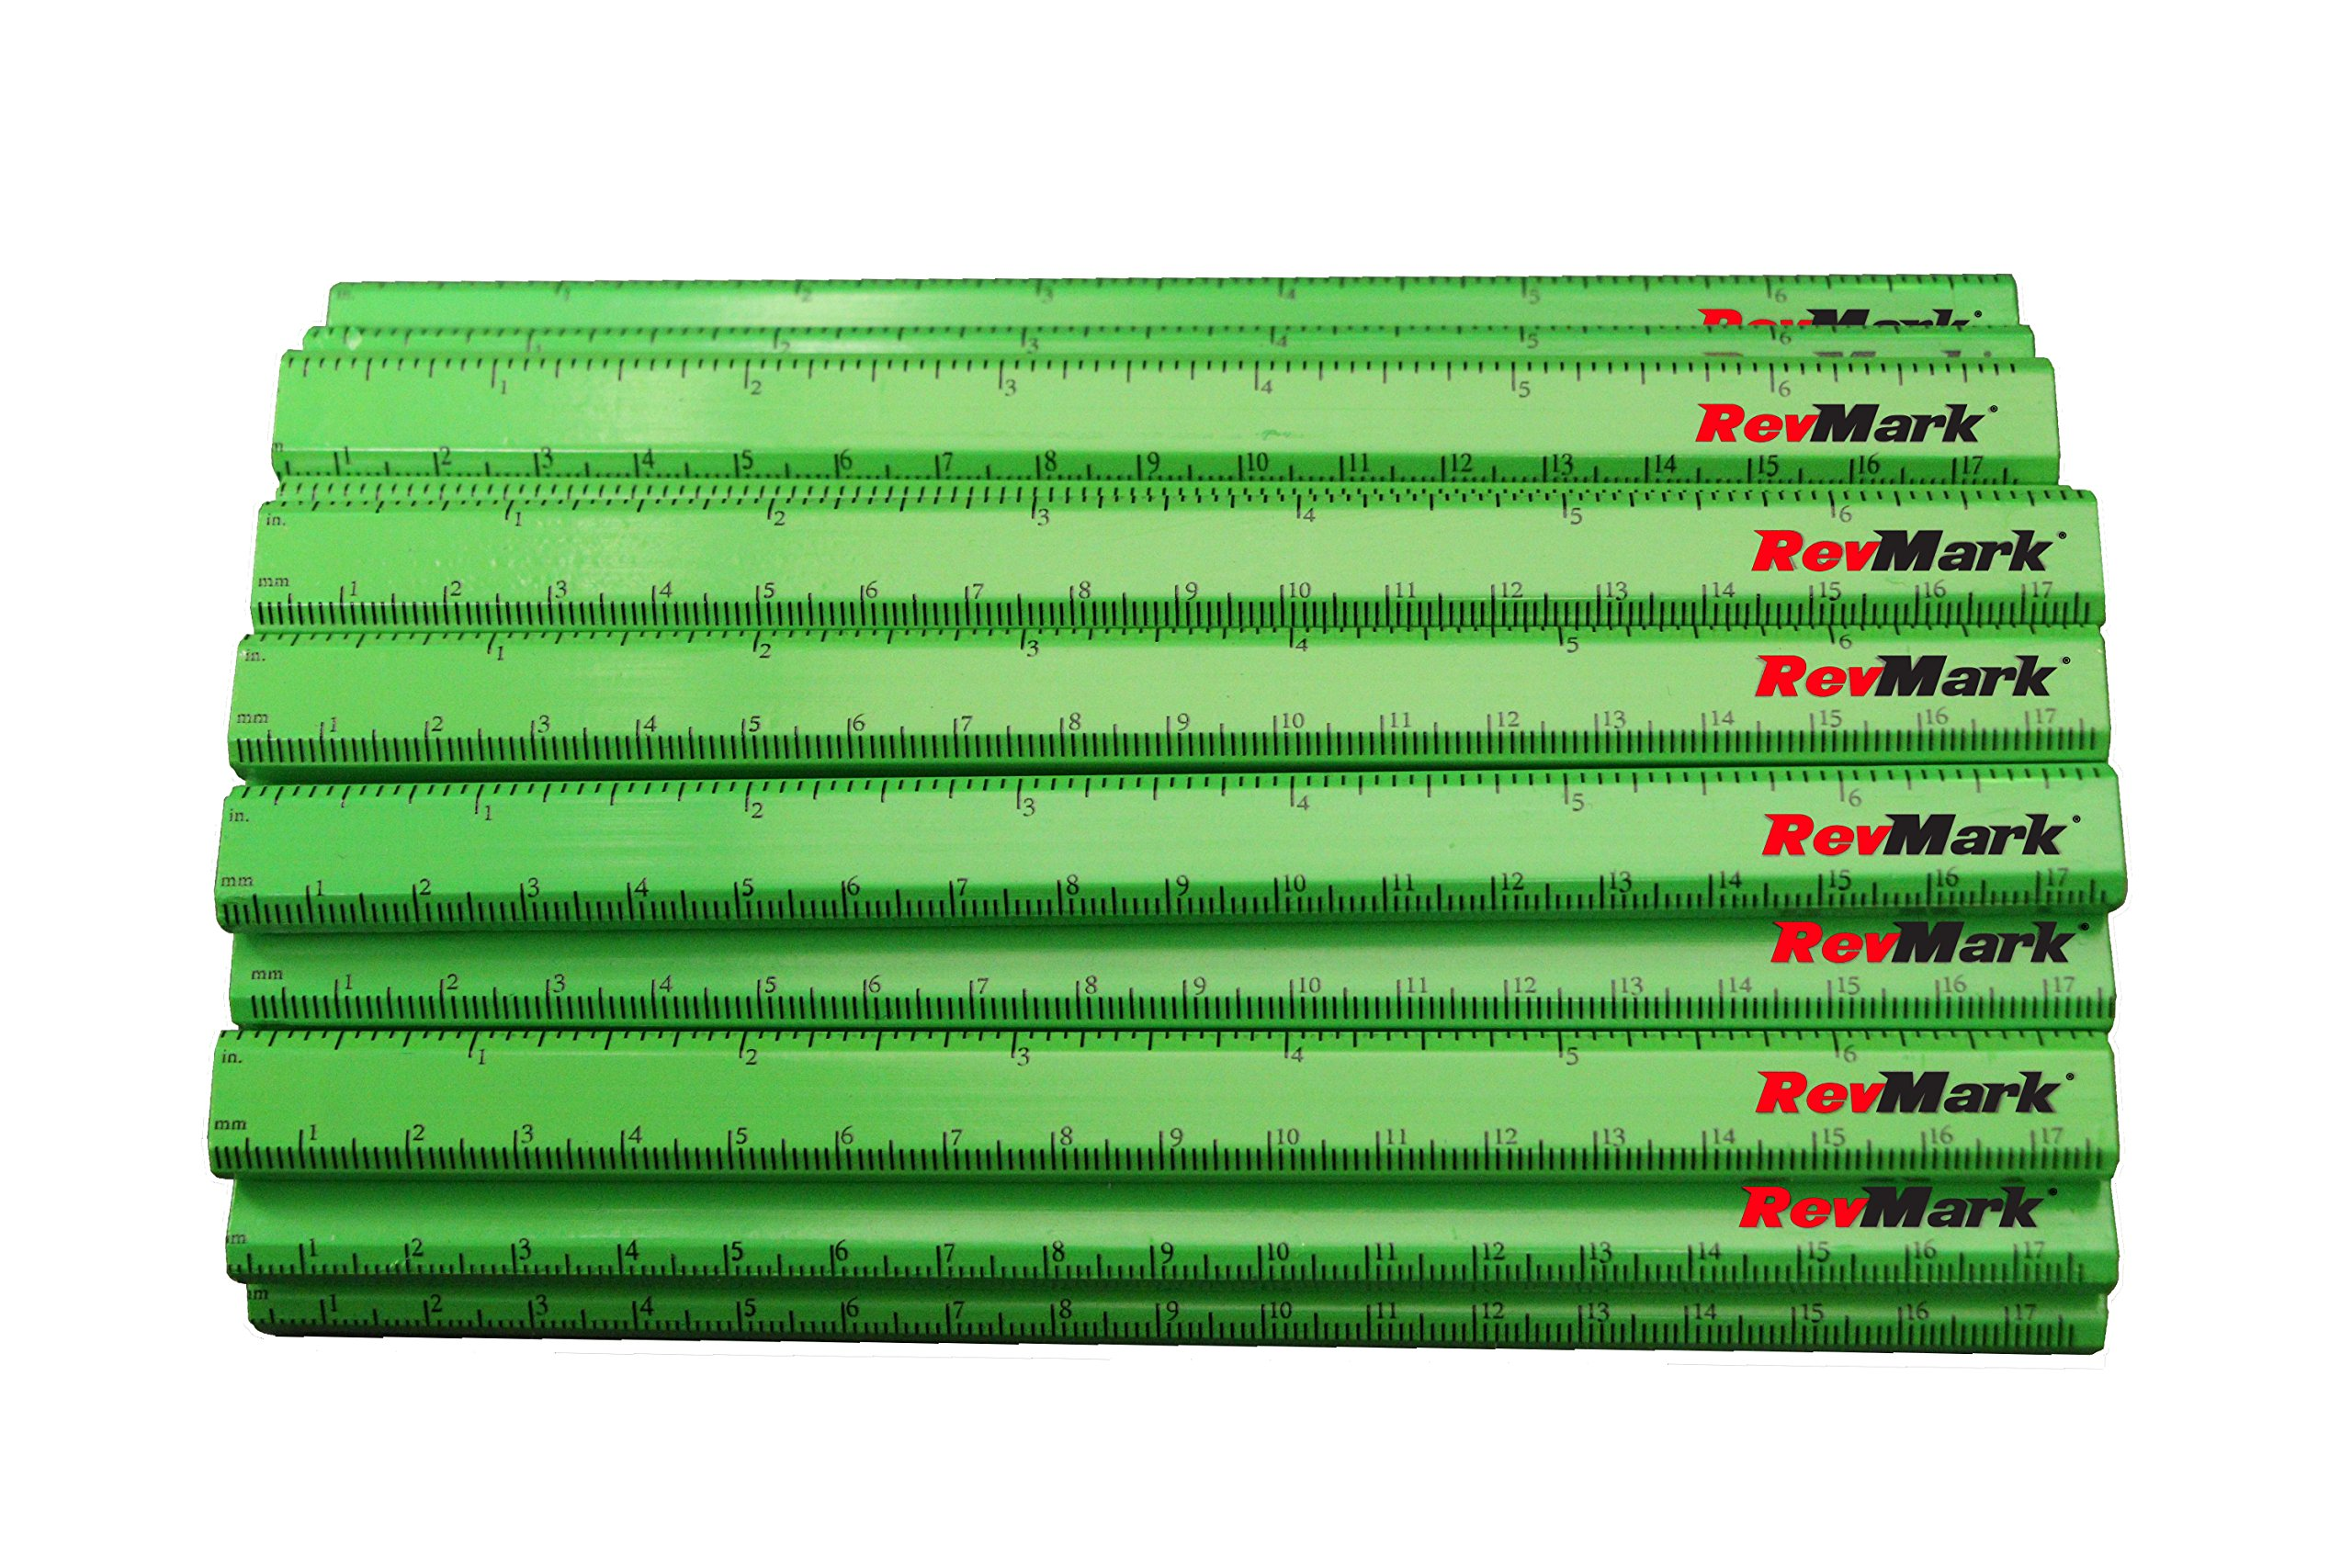 24 Pack - RevMark Carpenter Pencils w/Printed Ruler (Neon Green)